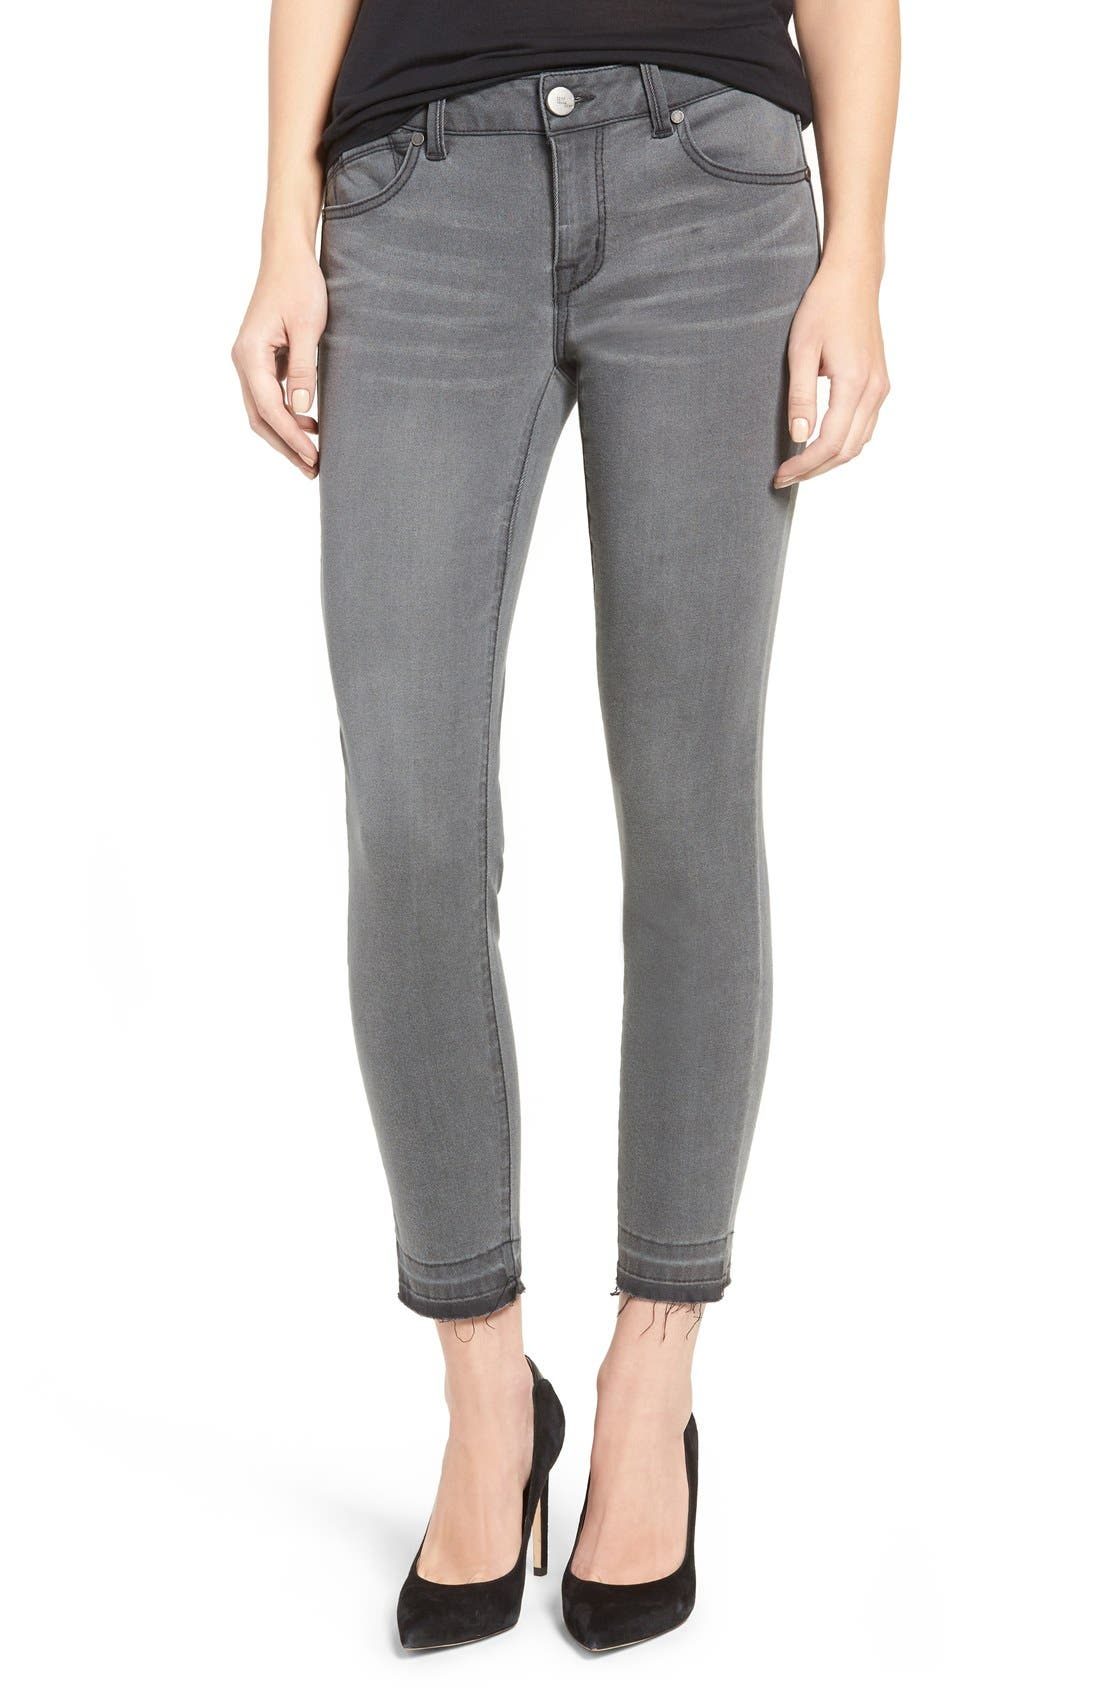 1822 Denim Raw Hem Crop Skinny Jeans